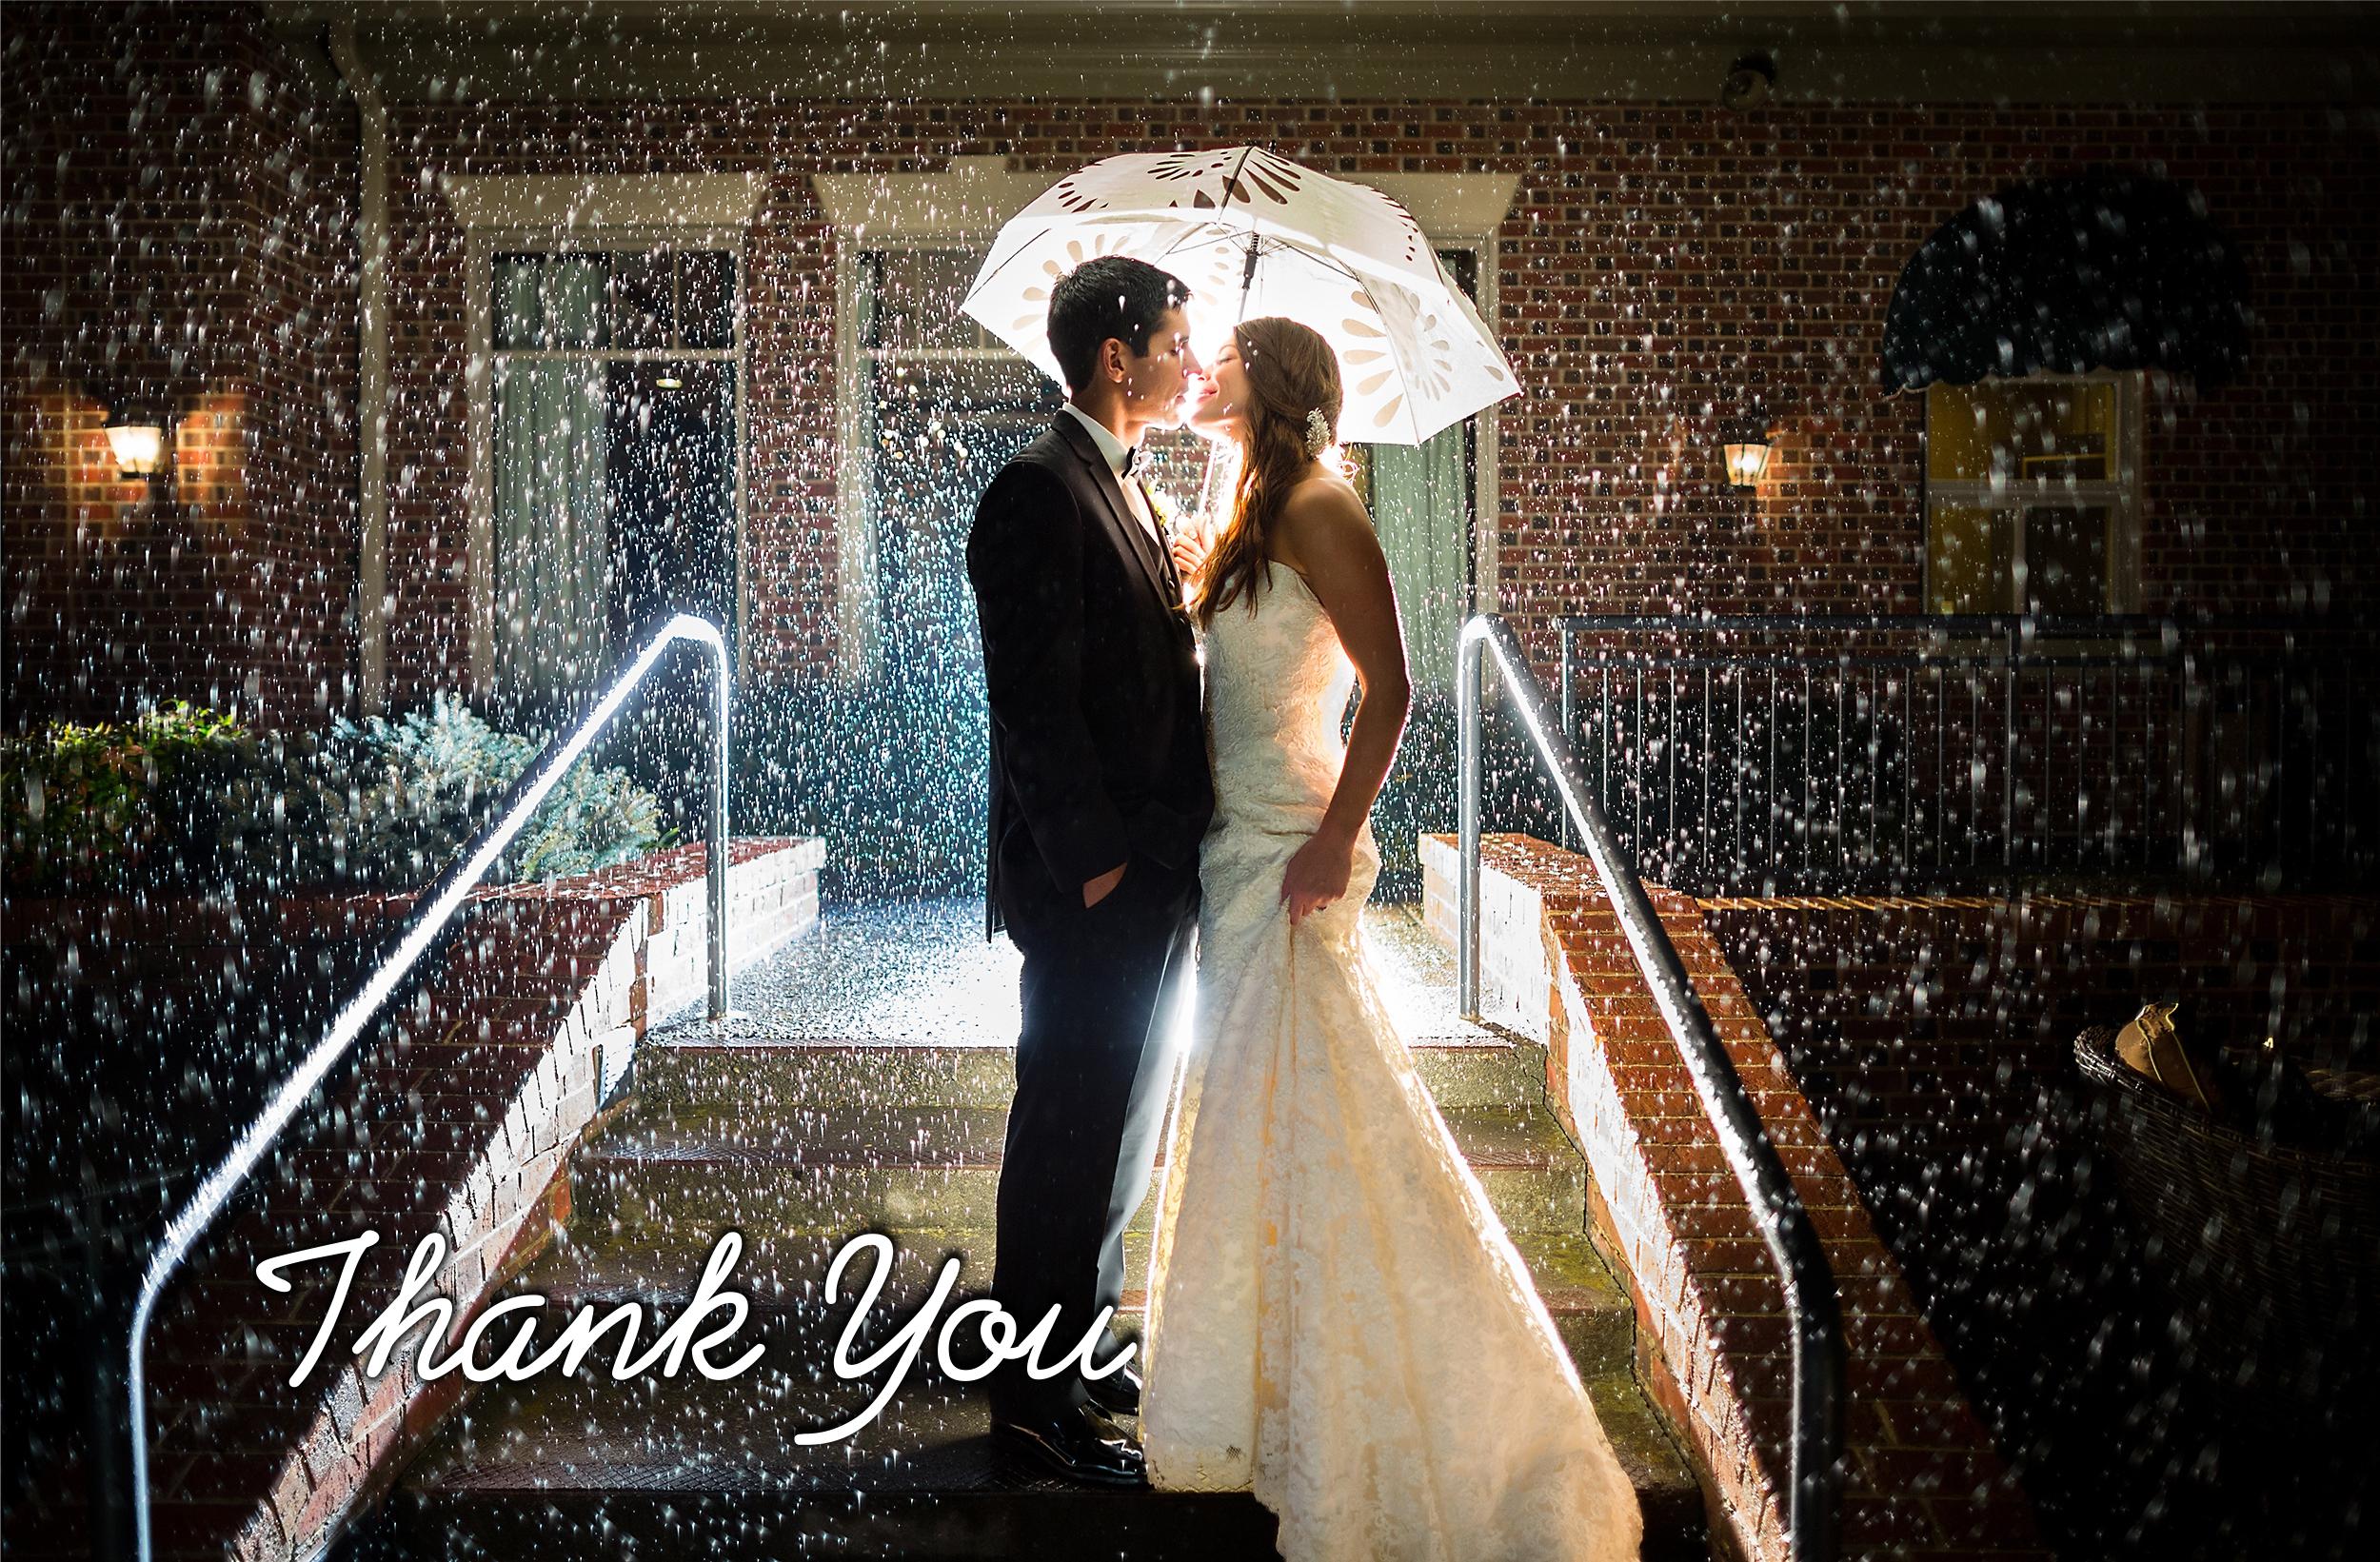 umbrella-wedding-rain.jpg